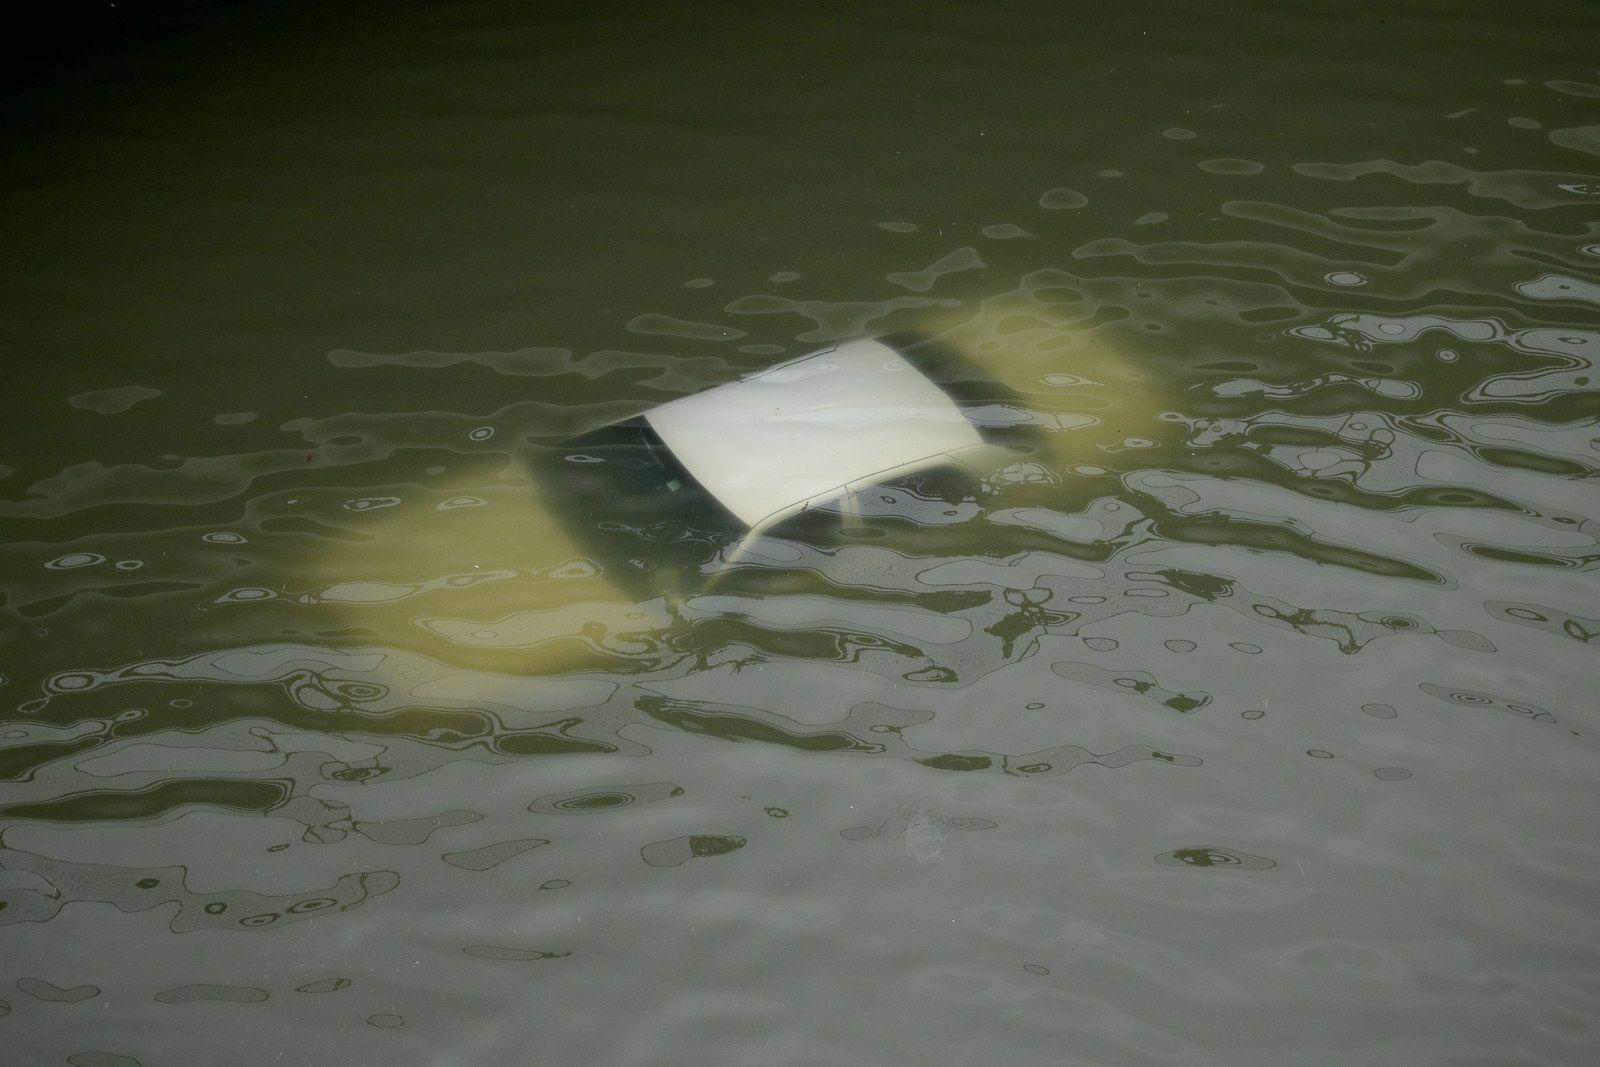 Pin By Greenphilosophie On Zz History Houston Flooding Hurricane Harvey